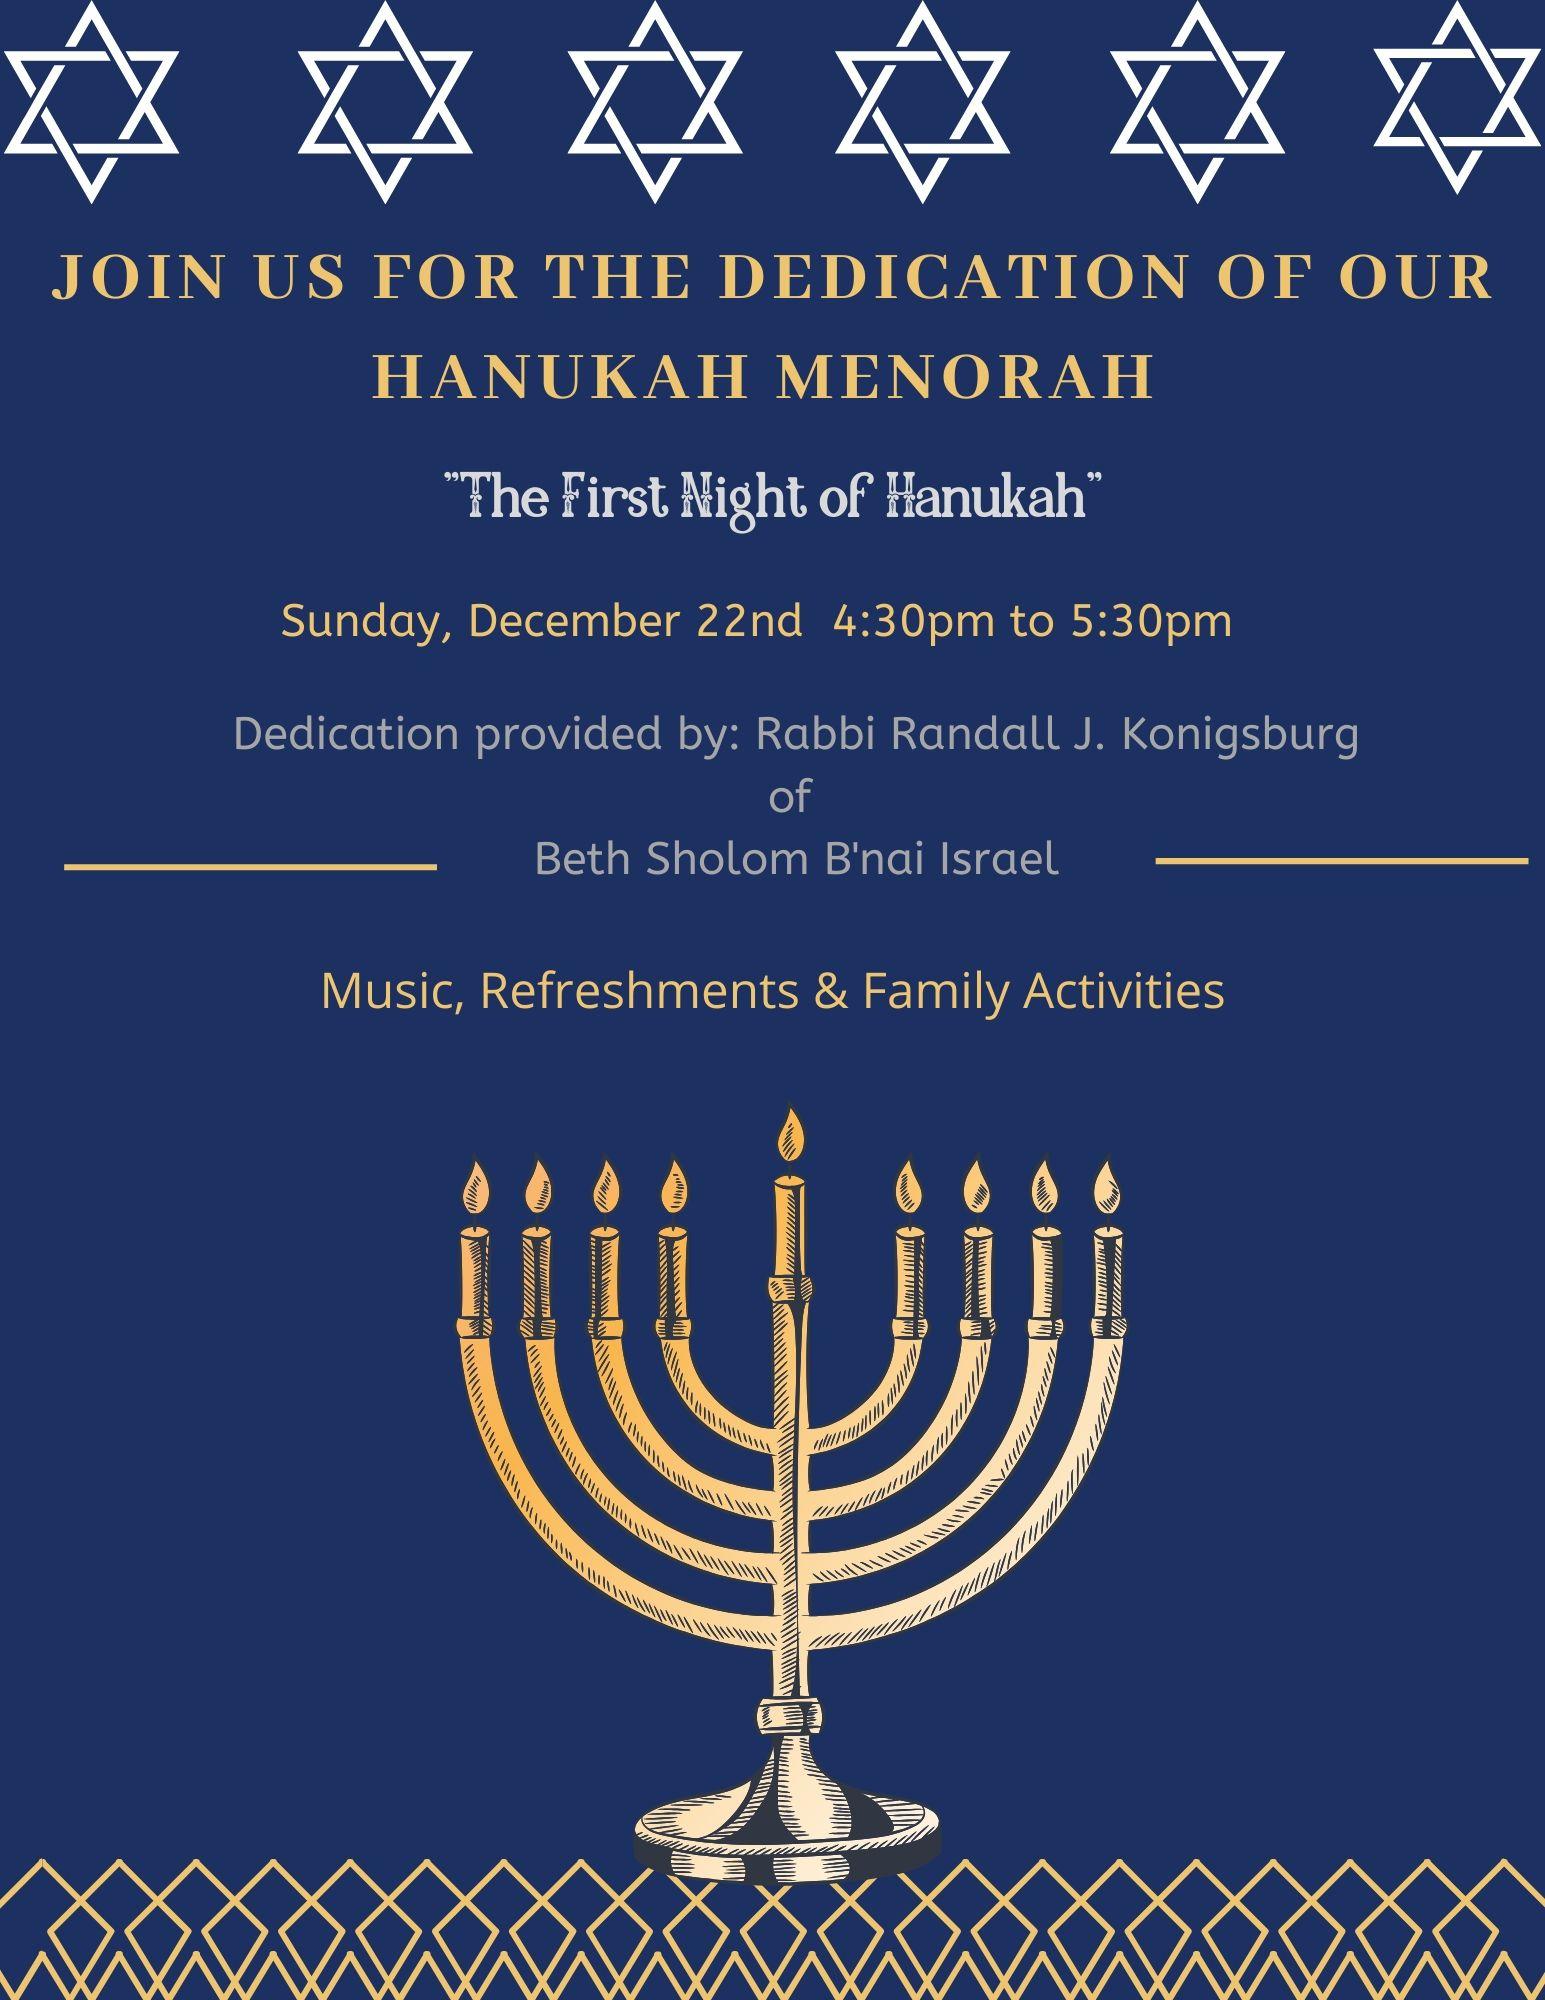 Join us for the dedication of our Hanukah Menorah